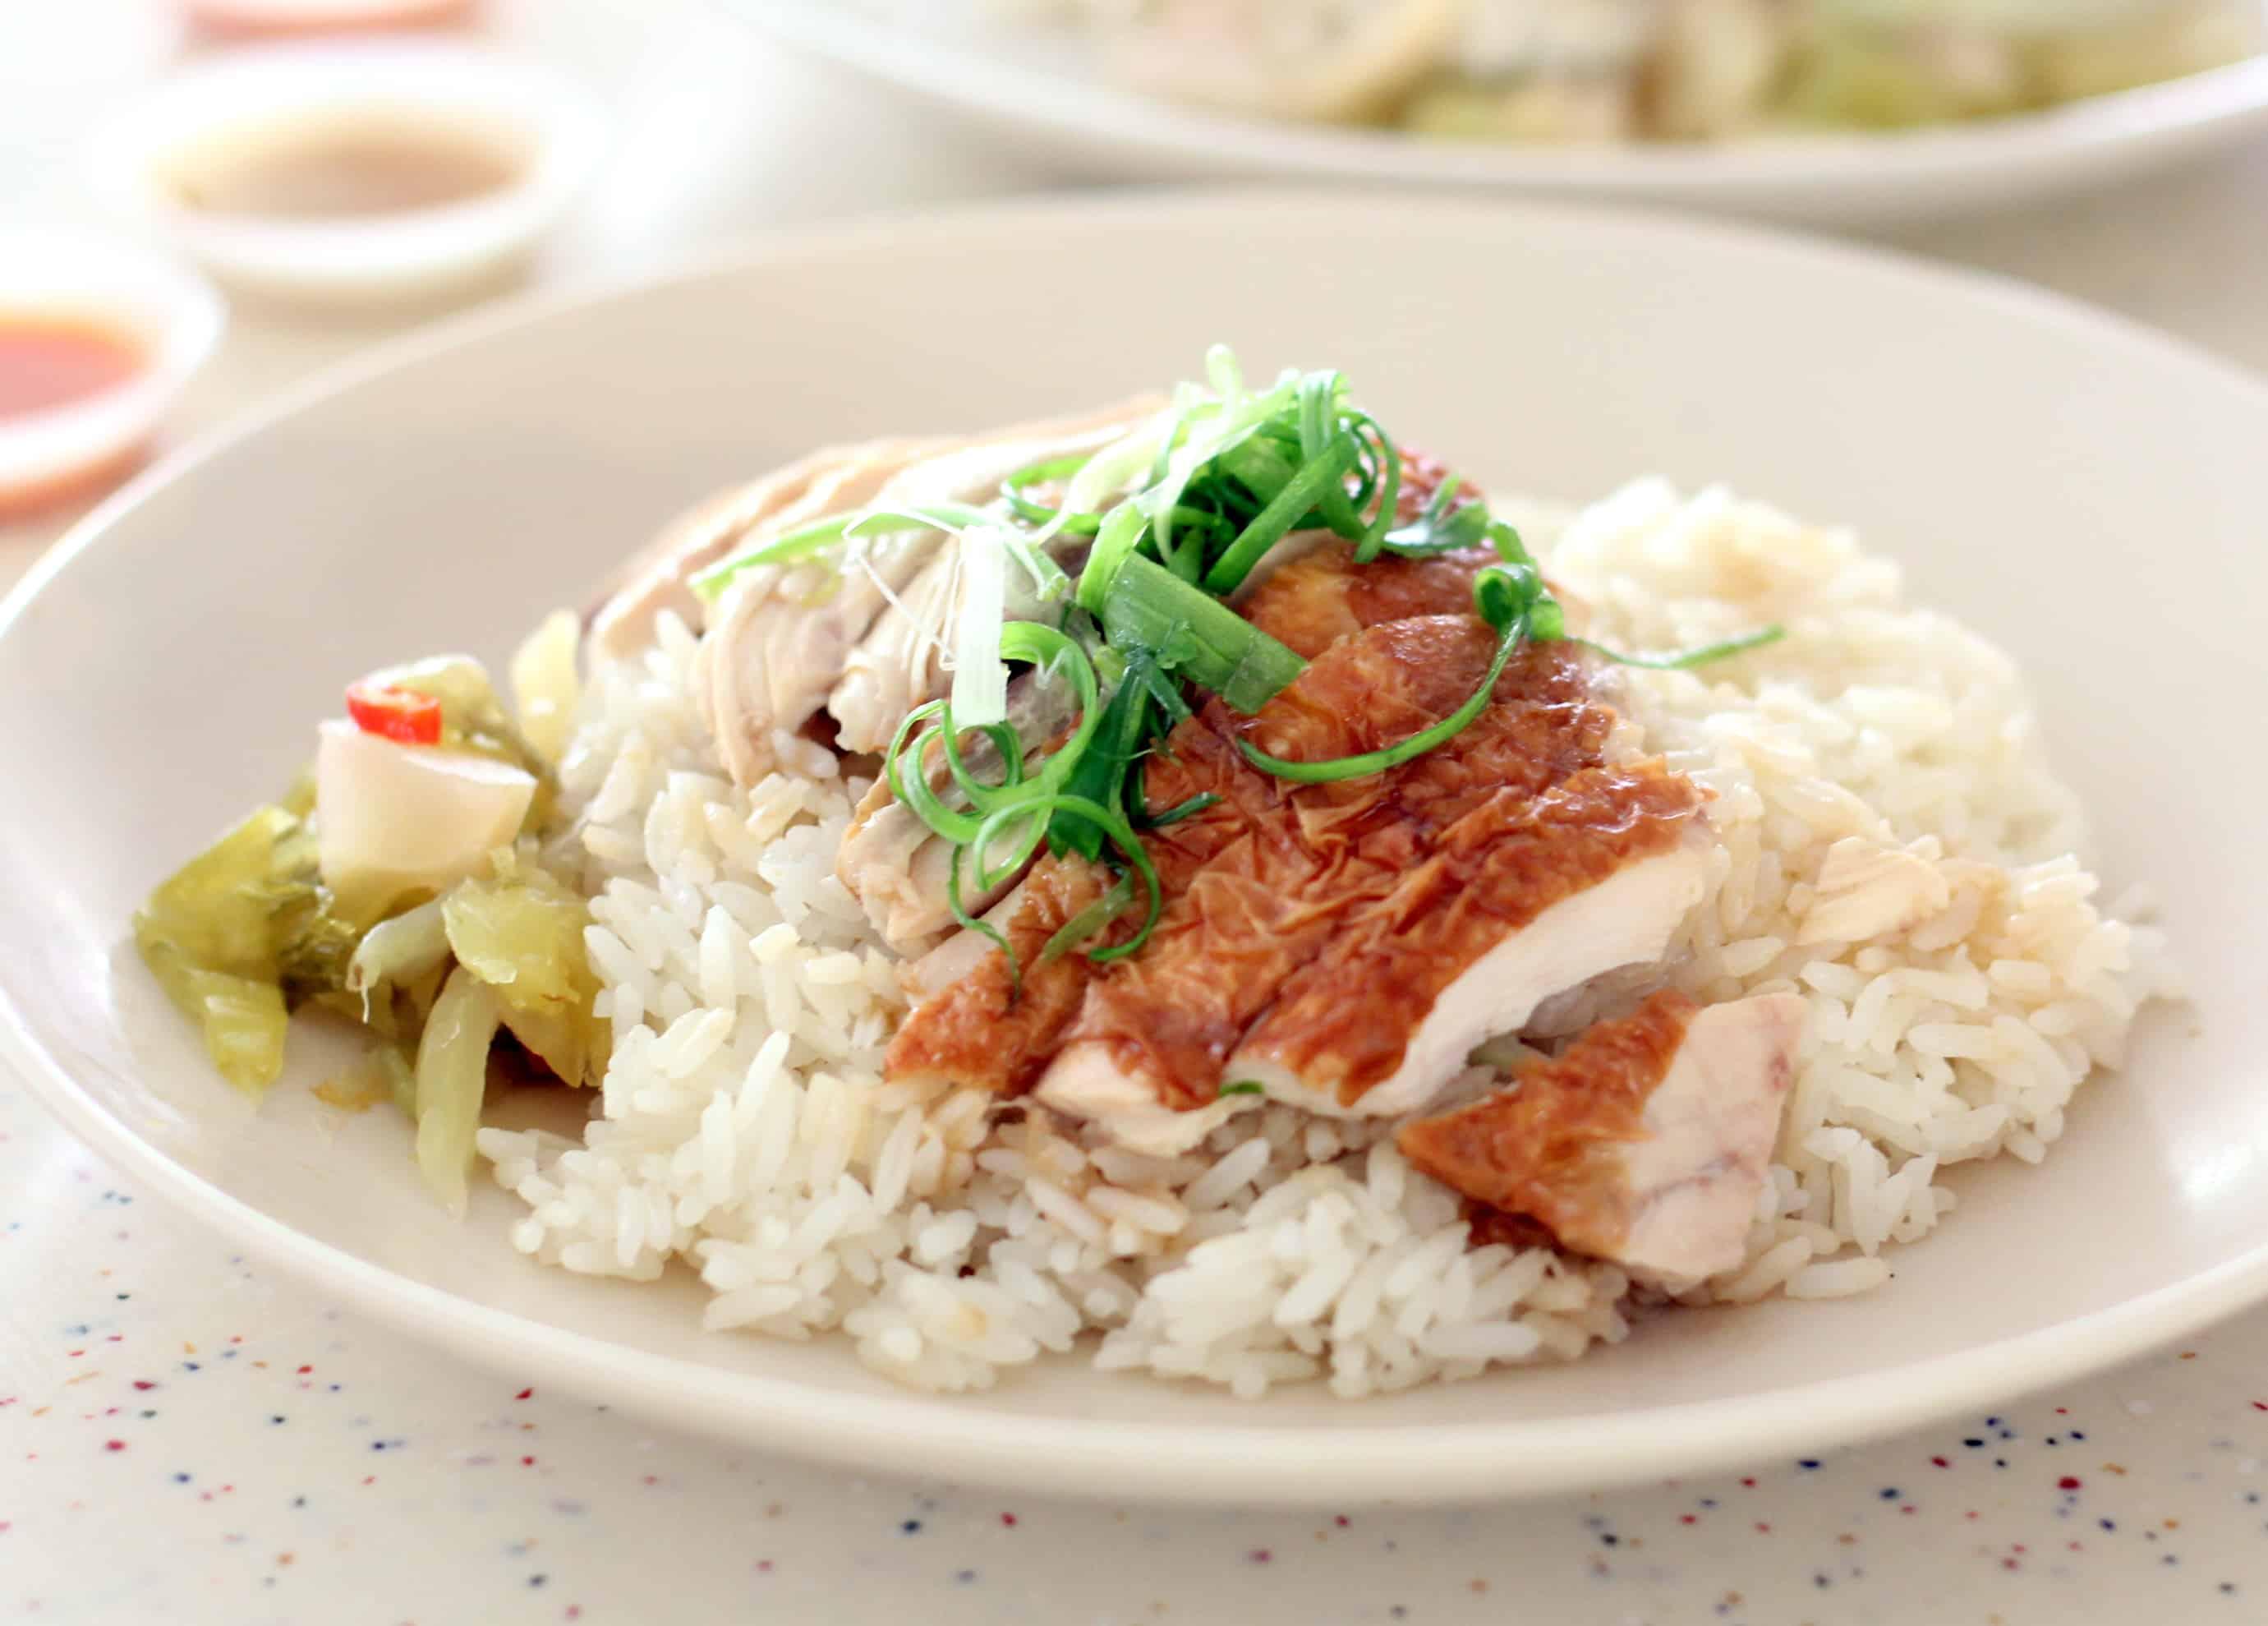 tiong-bahru-hainanese-boneless-chicken-rice-roast-chicken